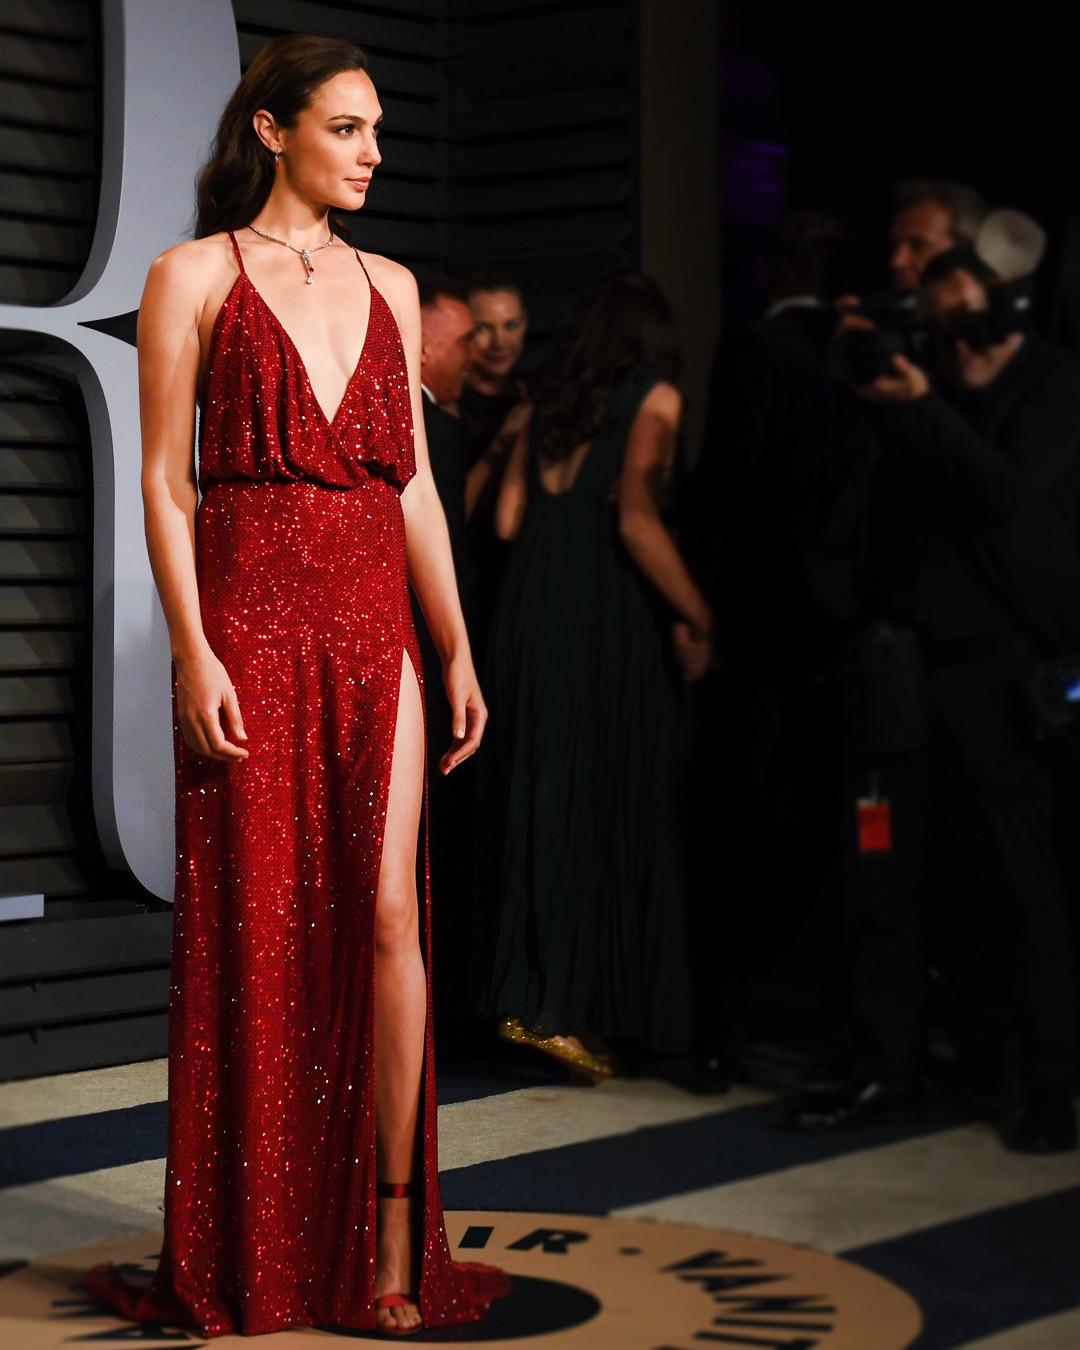 Oscars vs. Vanity Fair Red Carpet 2018: Which Celeb Look Wins? | E! News